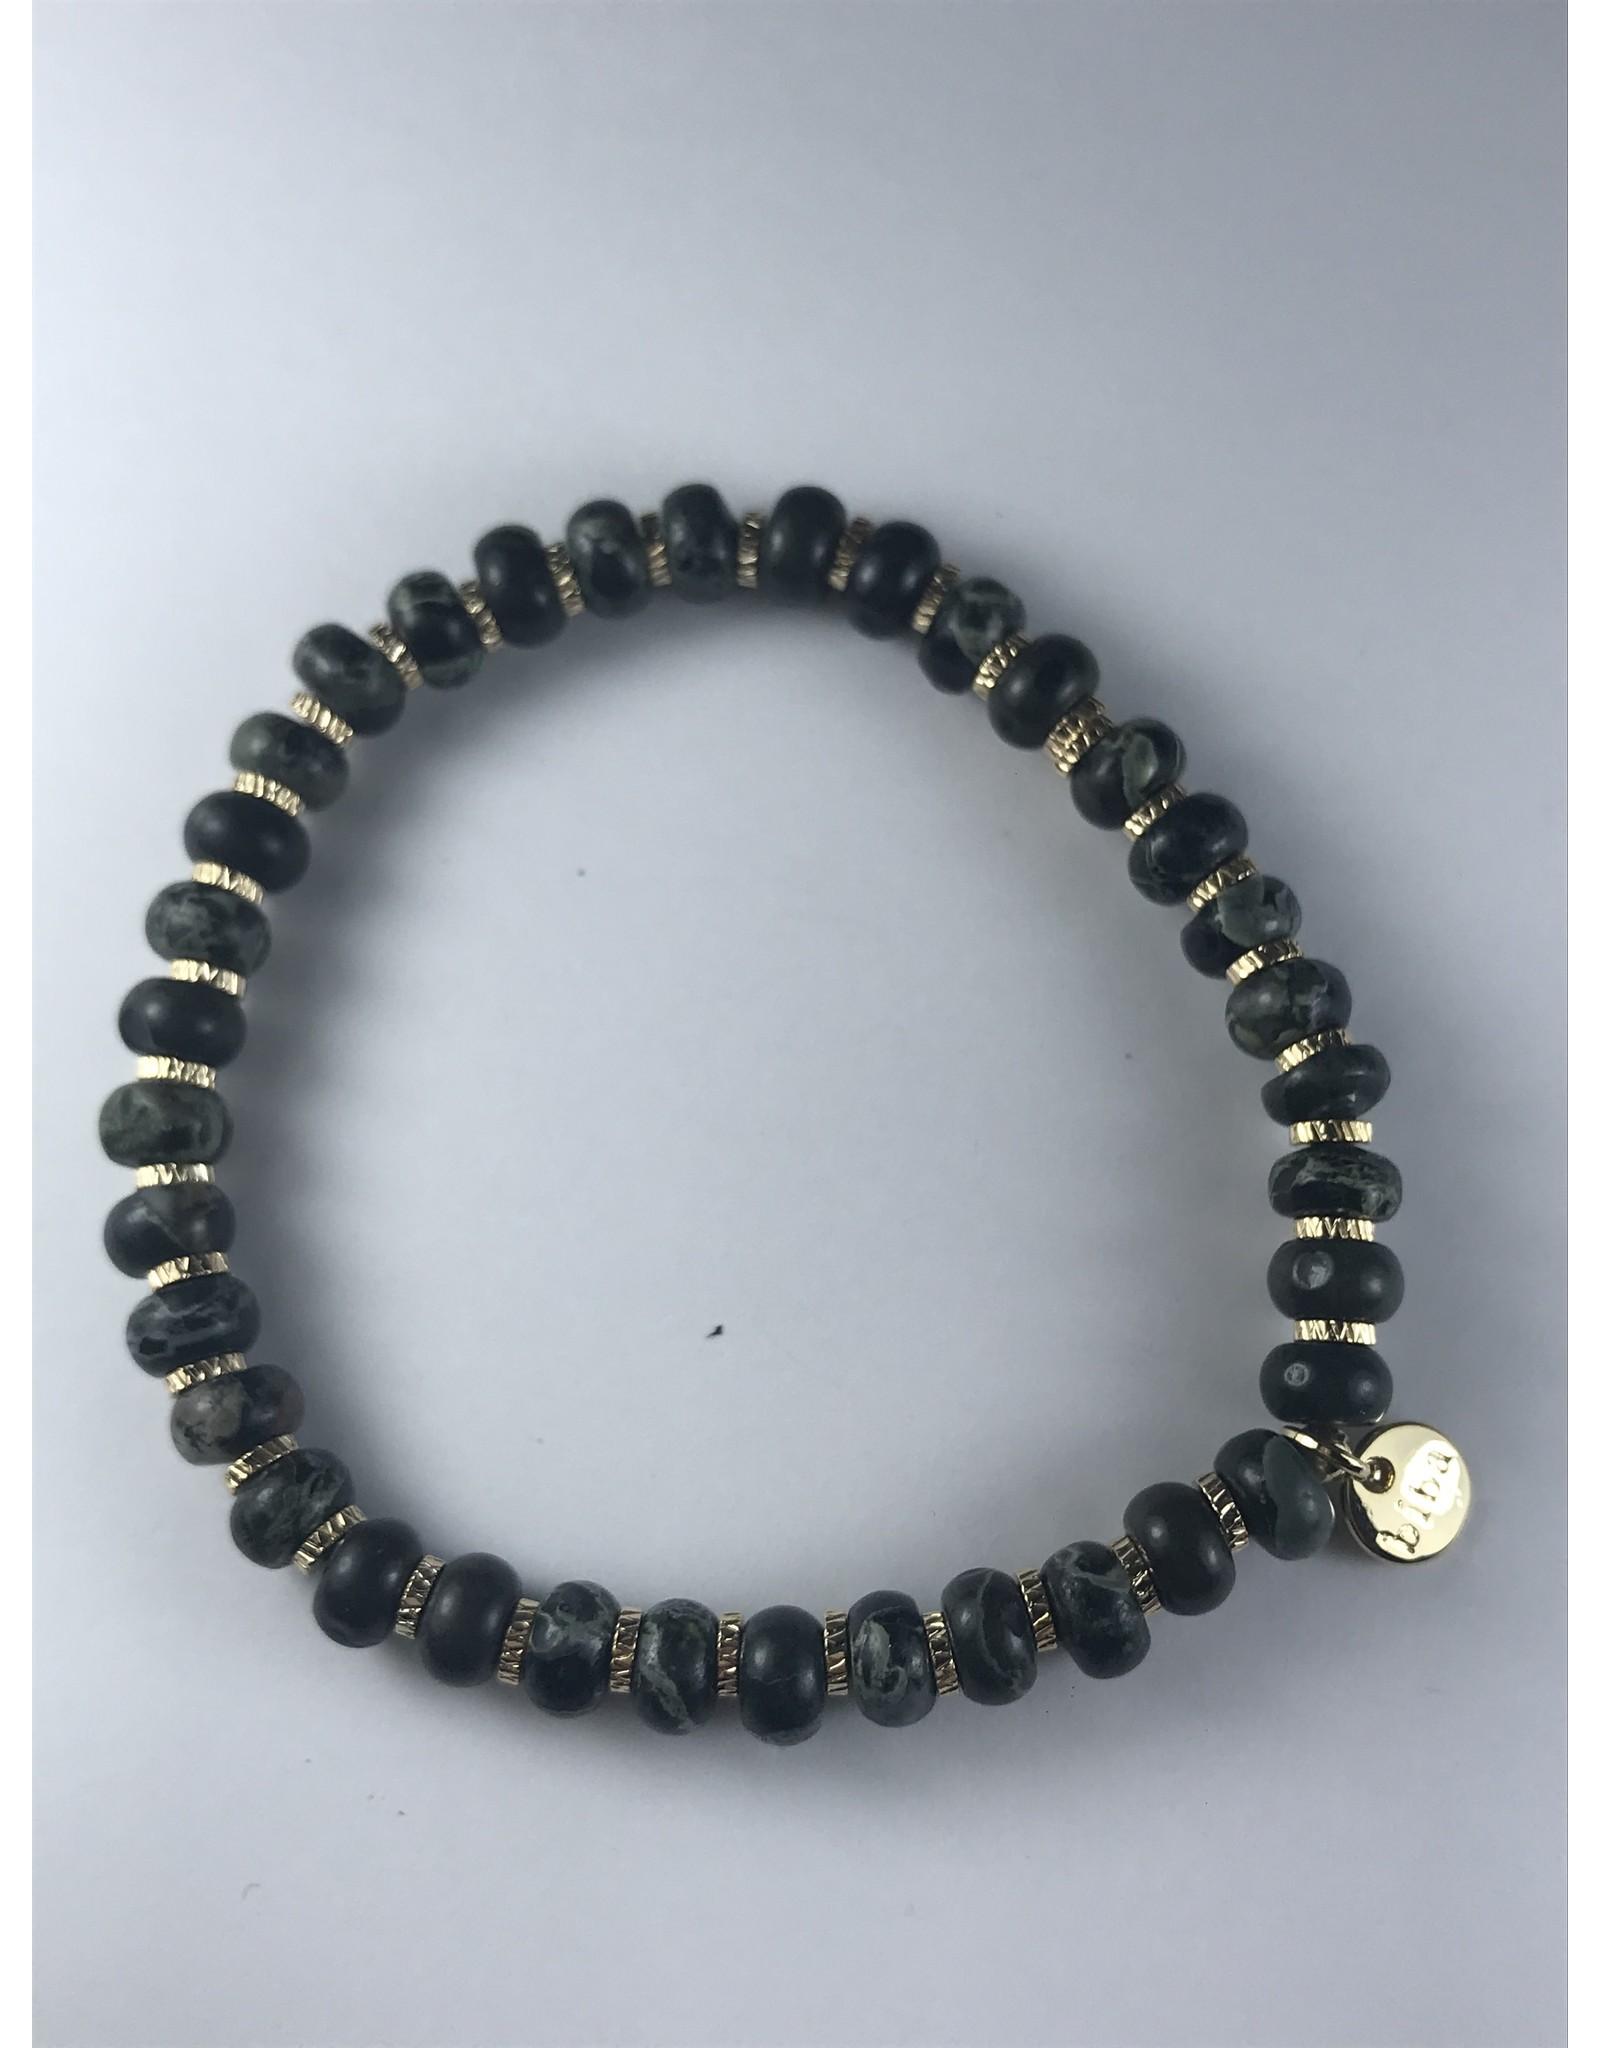 Biba stevige armband - grijs-groene kralen op fijne gouden armband